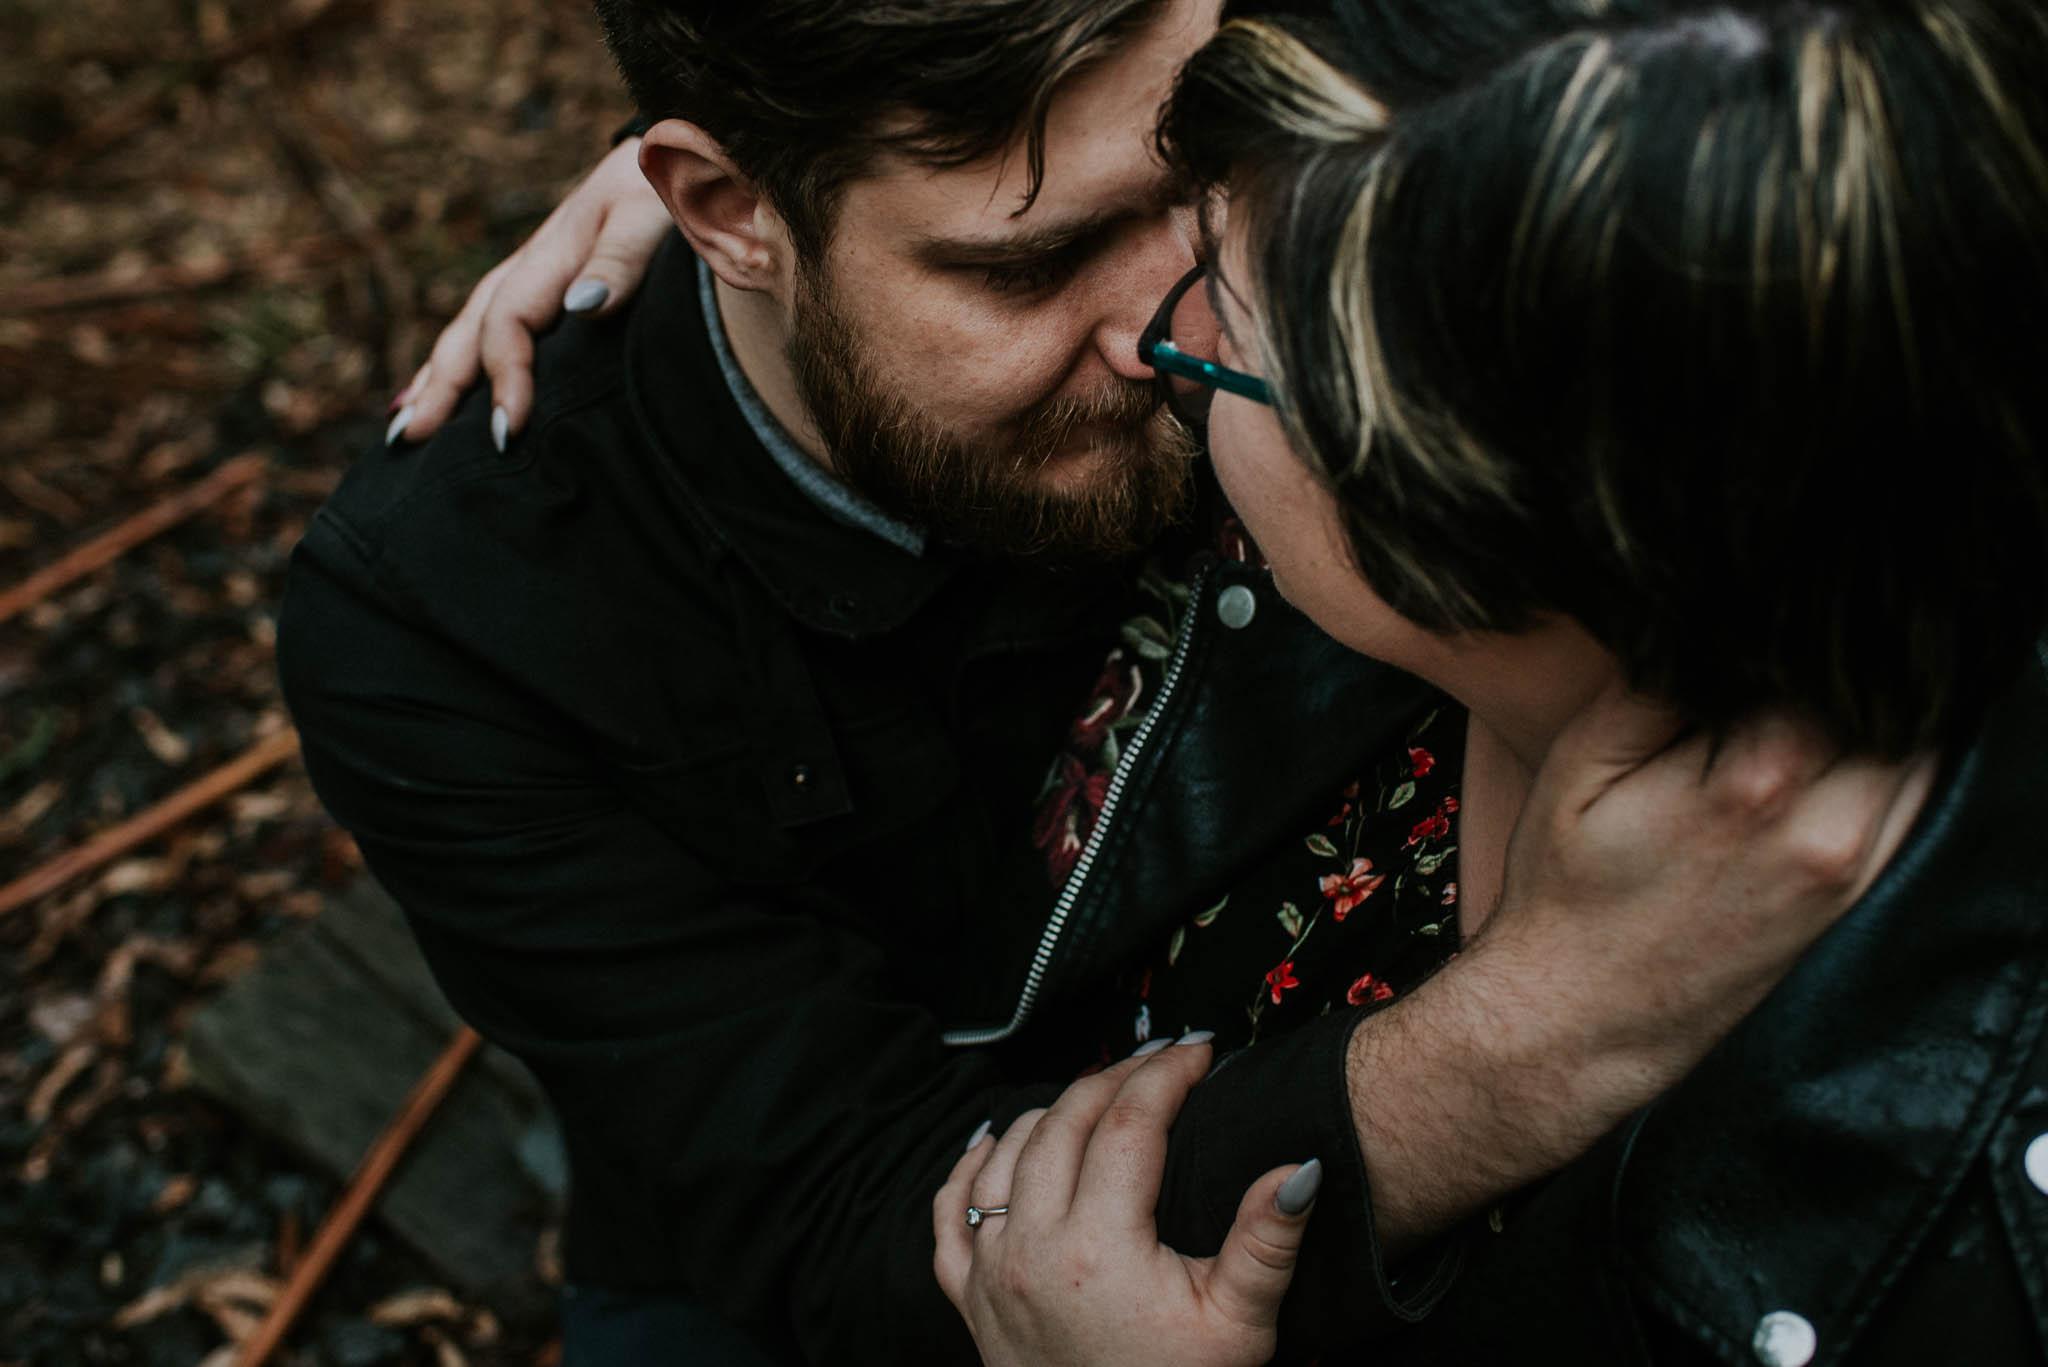 launceston couples photographer-10.jpg